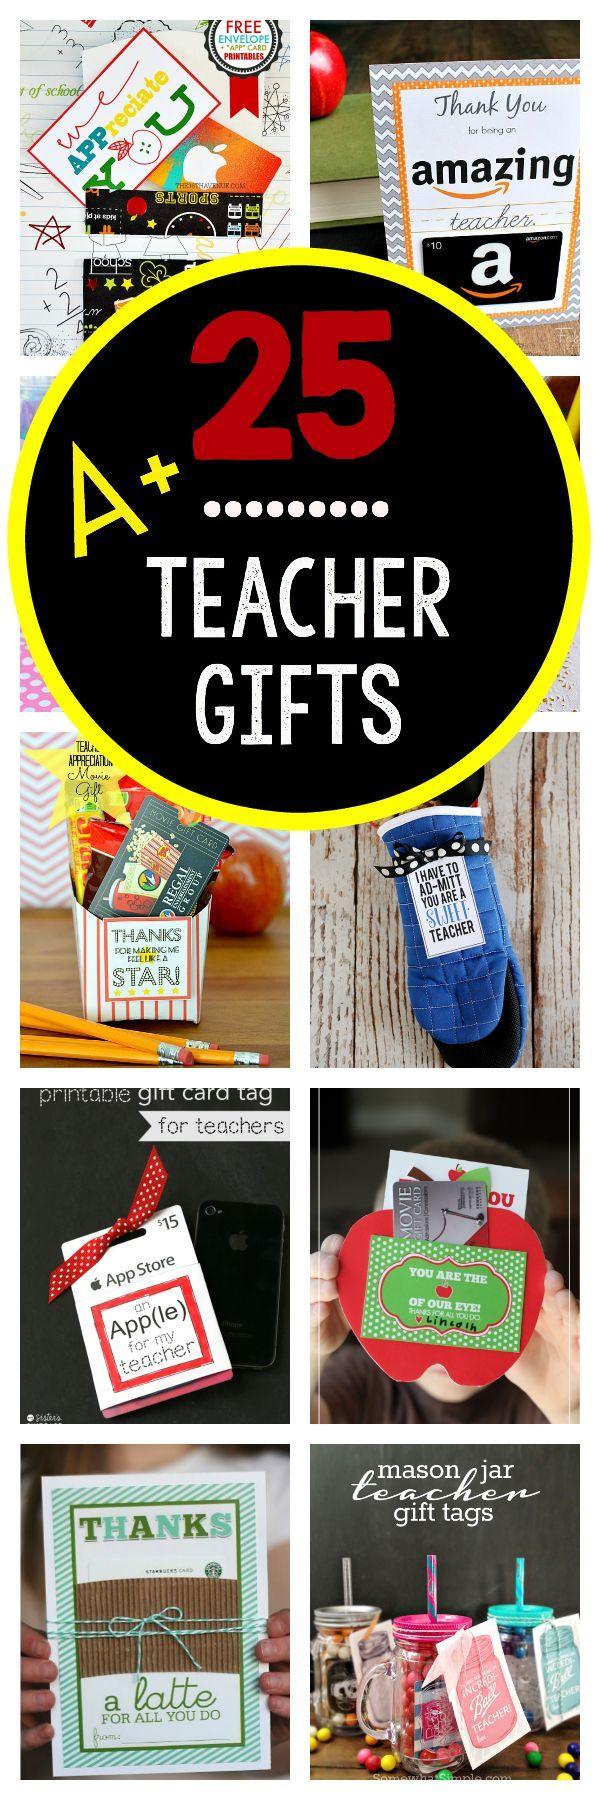 Teacher Appreciation Gifts That Teachers Will Really Love!